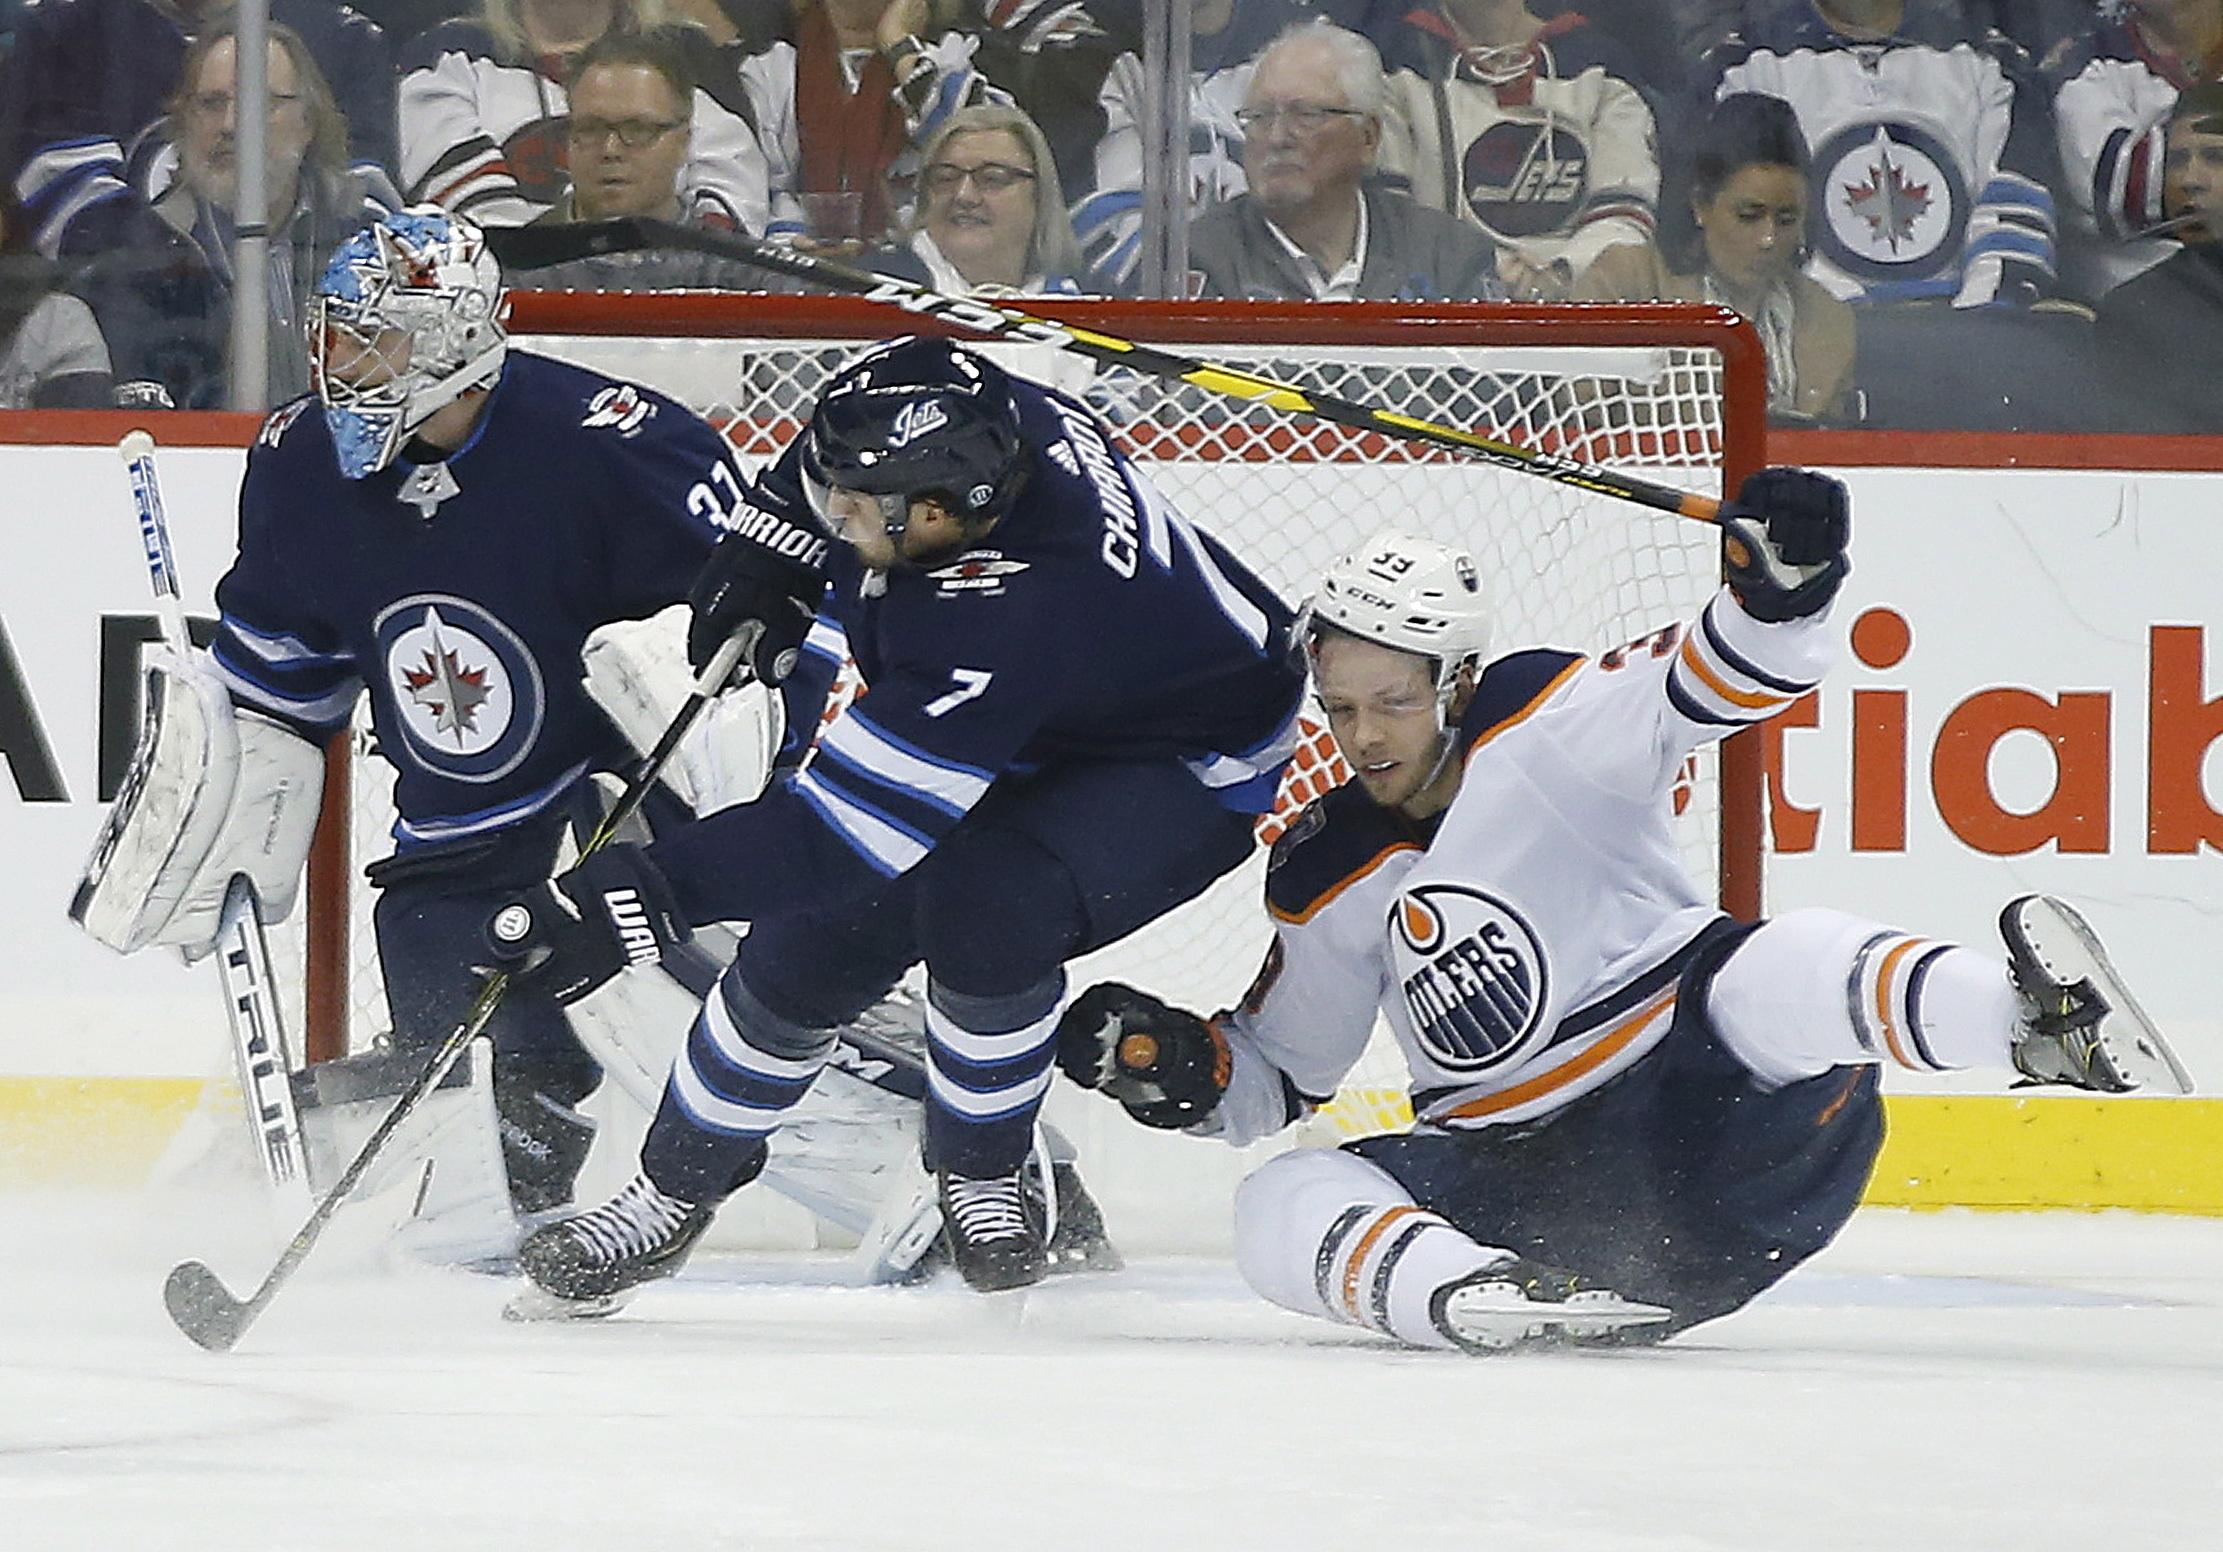 Josh Morrissey scores in OT, Jets beat Oilers 5-4